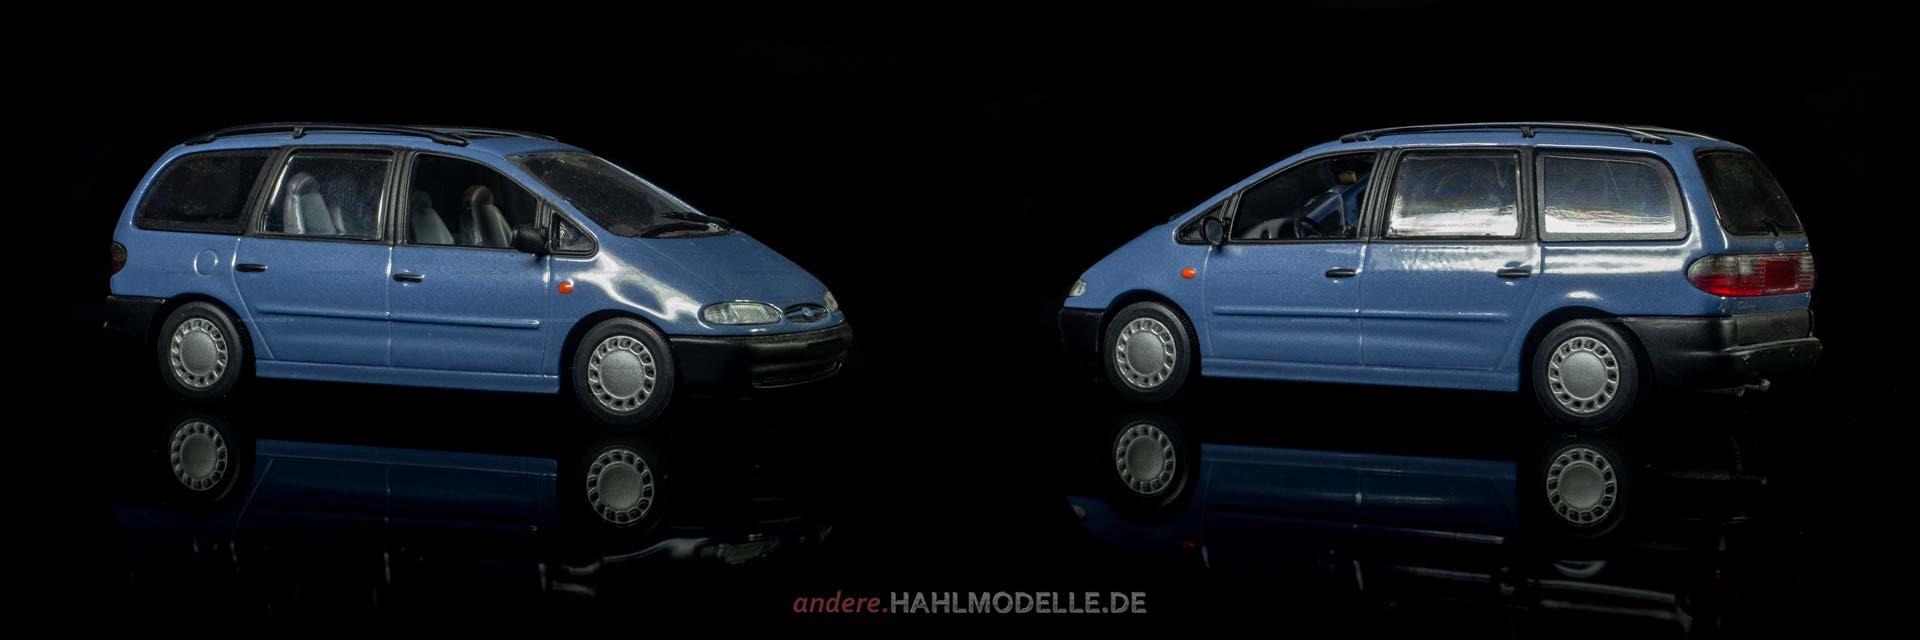 Ford Galaxy (Galaxy '95) | Van | Minichamps | 1:43 | www.andere.hahlmodelle.de